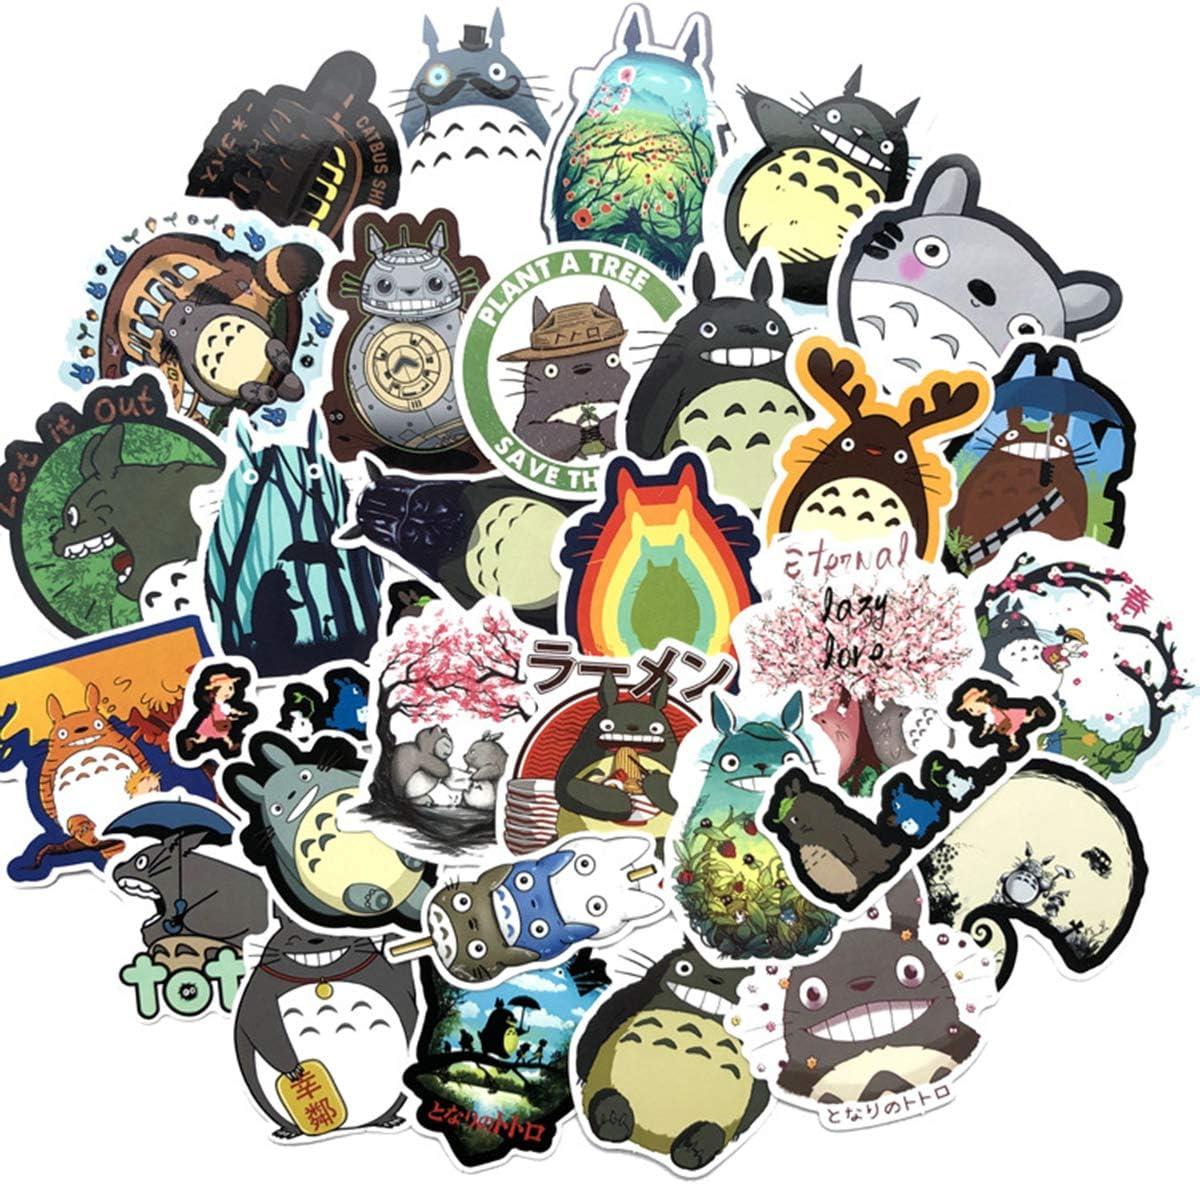 64PCS My Neighbor Totoro, Clear Stickers No-Duplicate Waterproof Vinyl Stickers for Skateboard Luggage Helmet Guitar (Totoro)